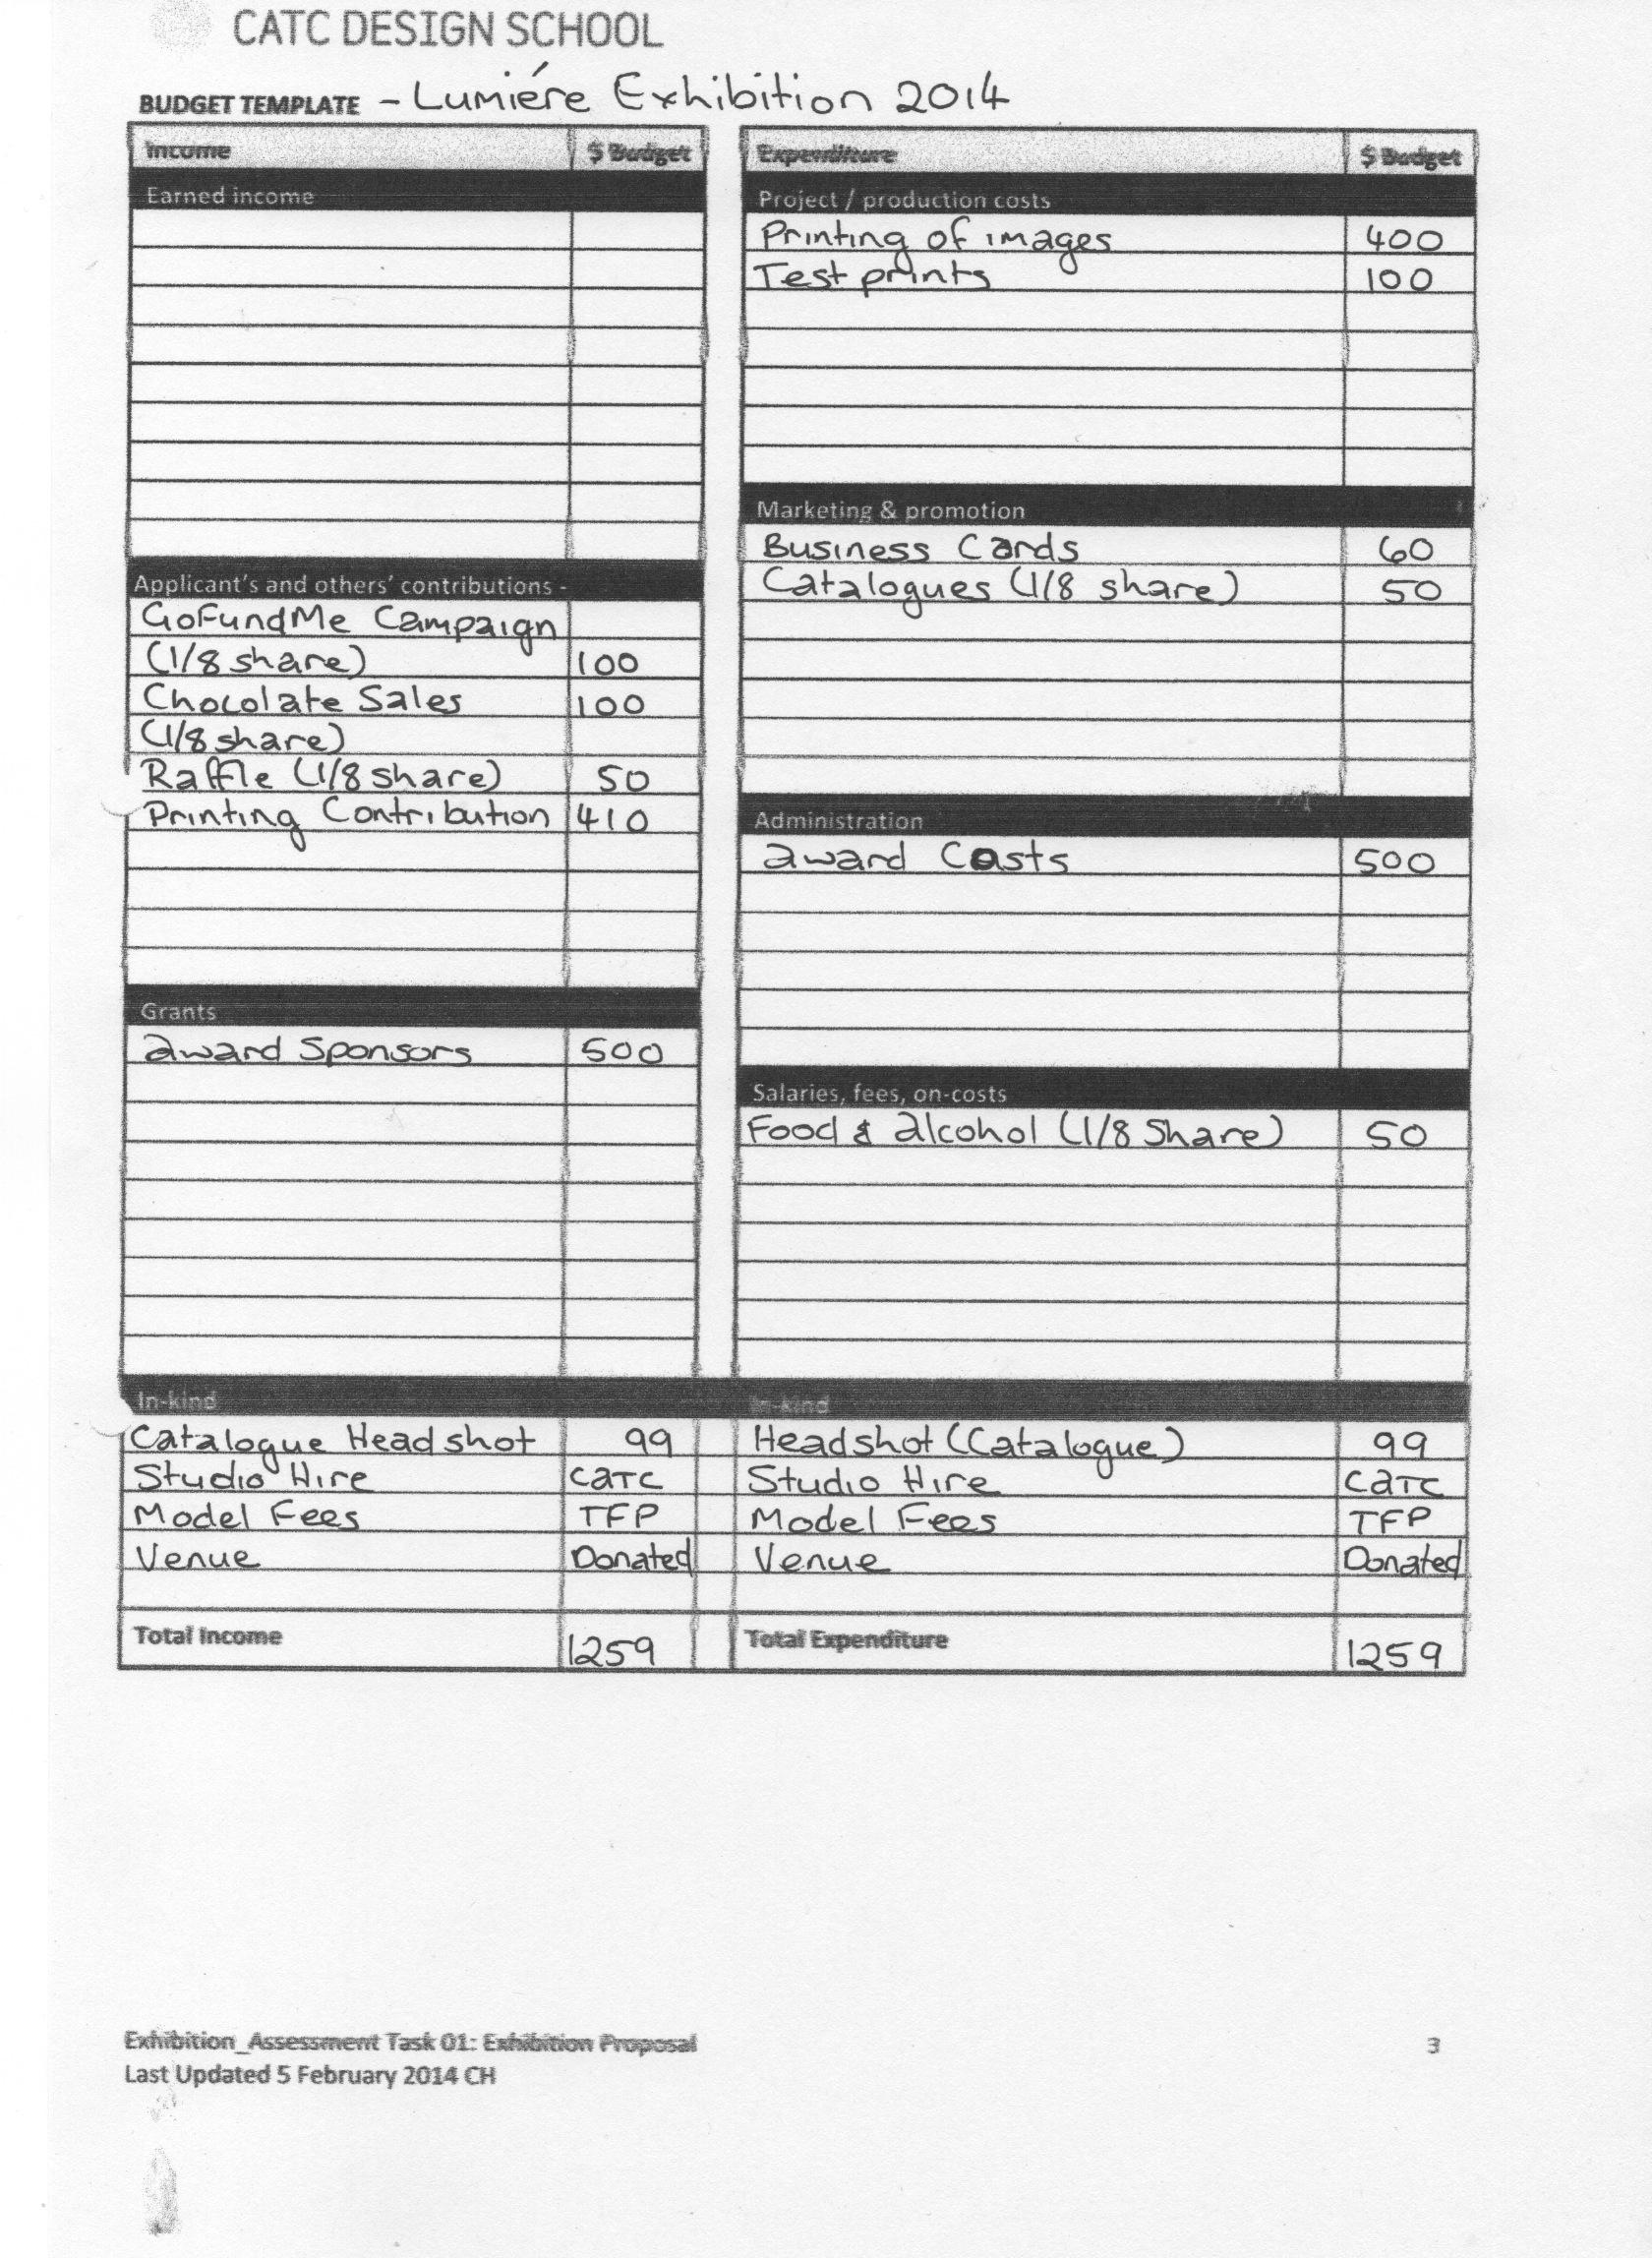 exhibition budget | Exhibition Assessment1